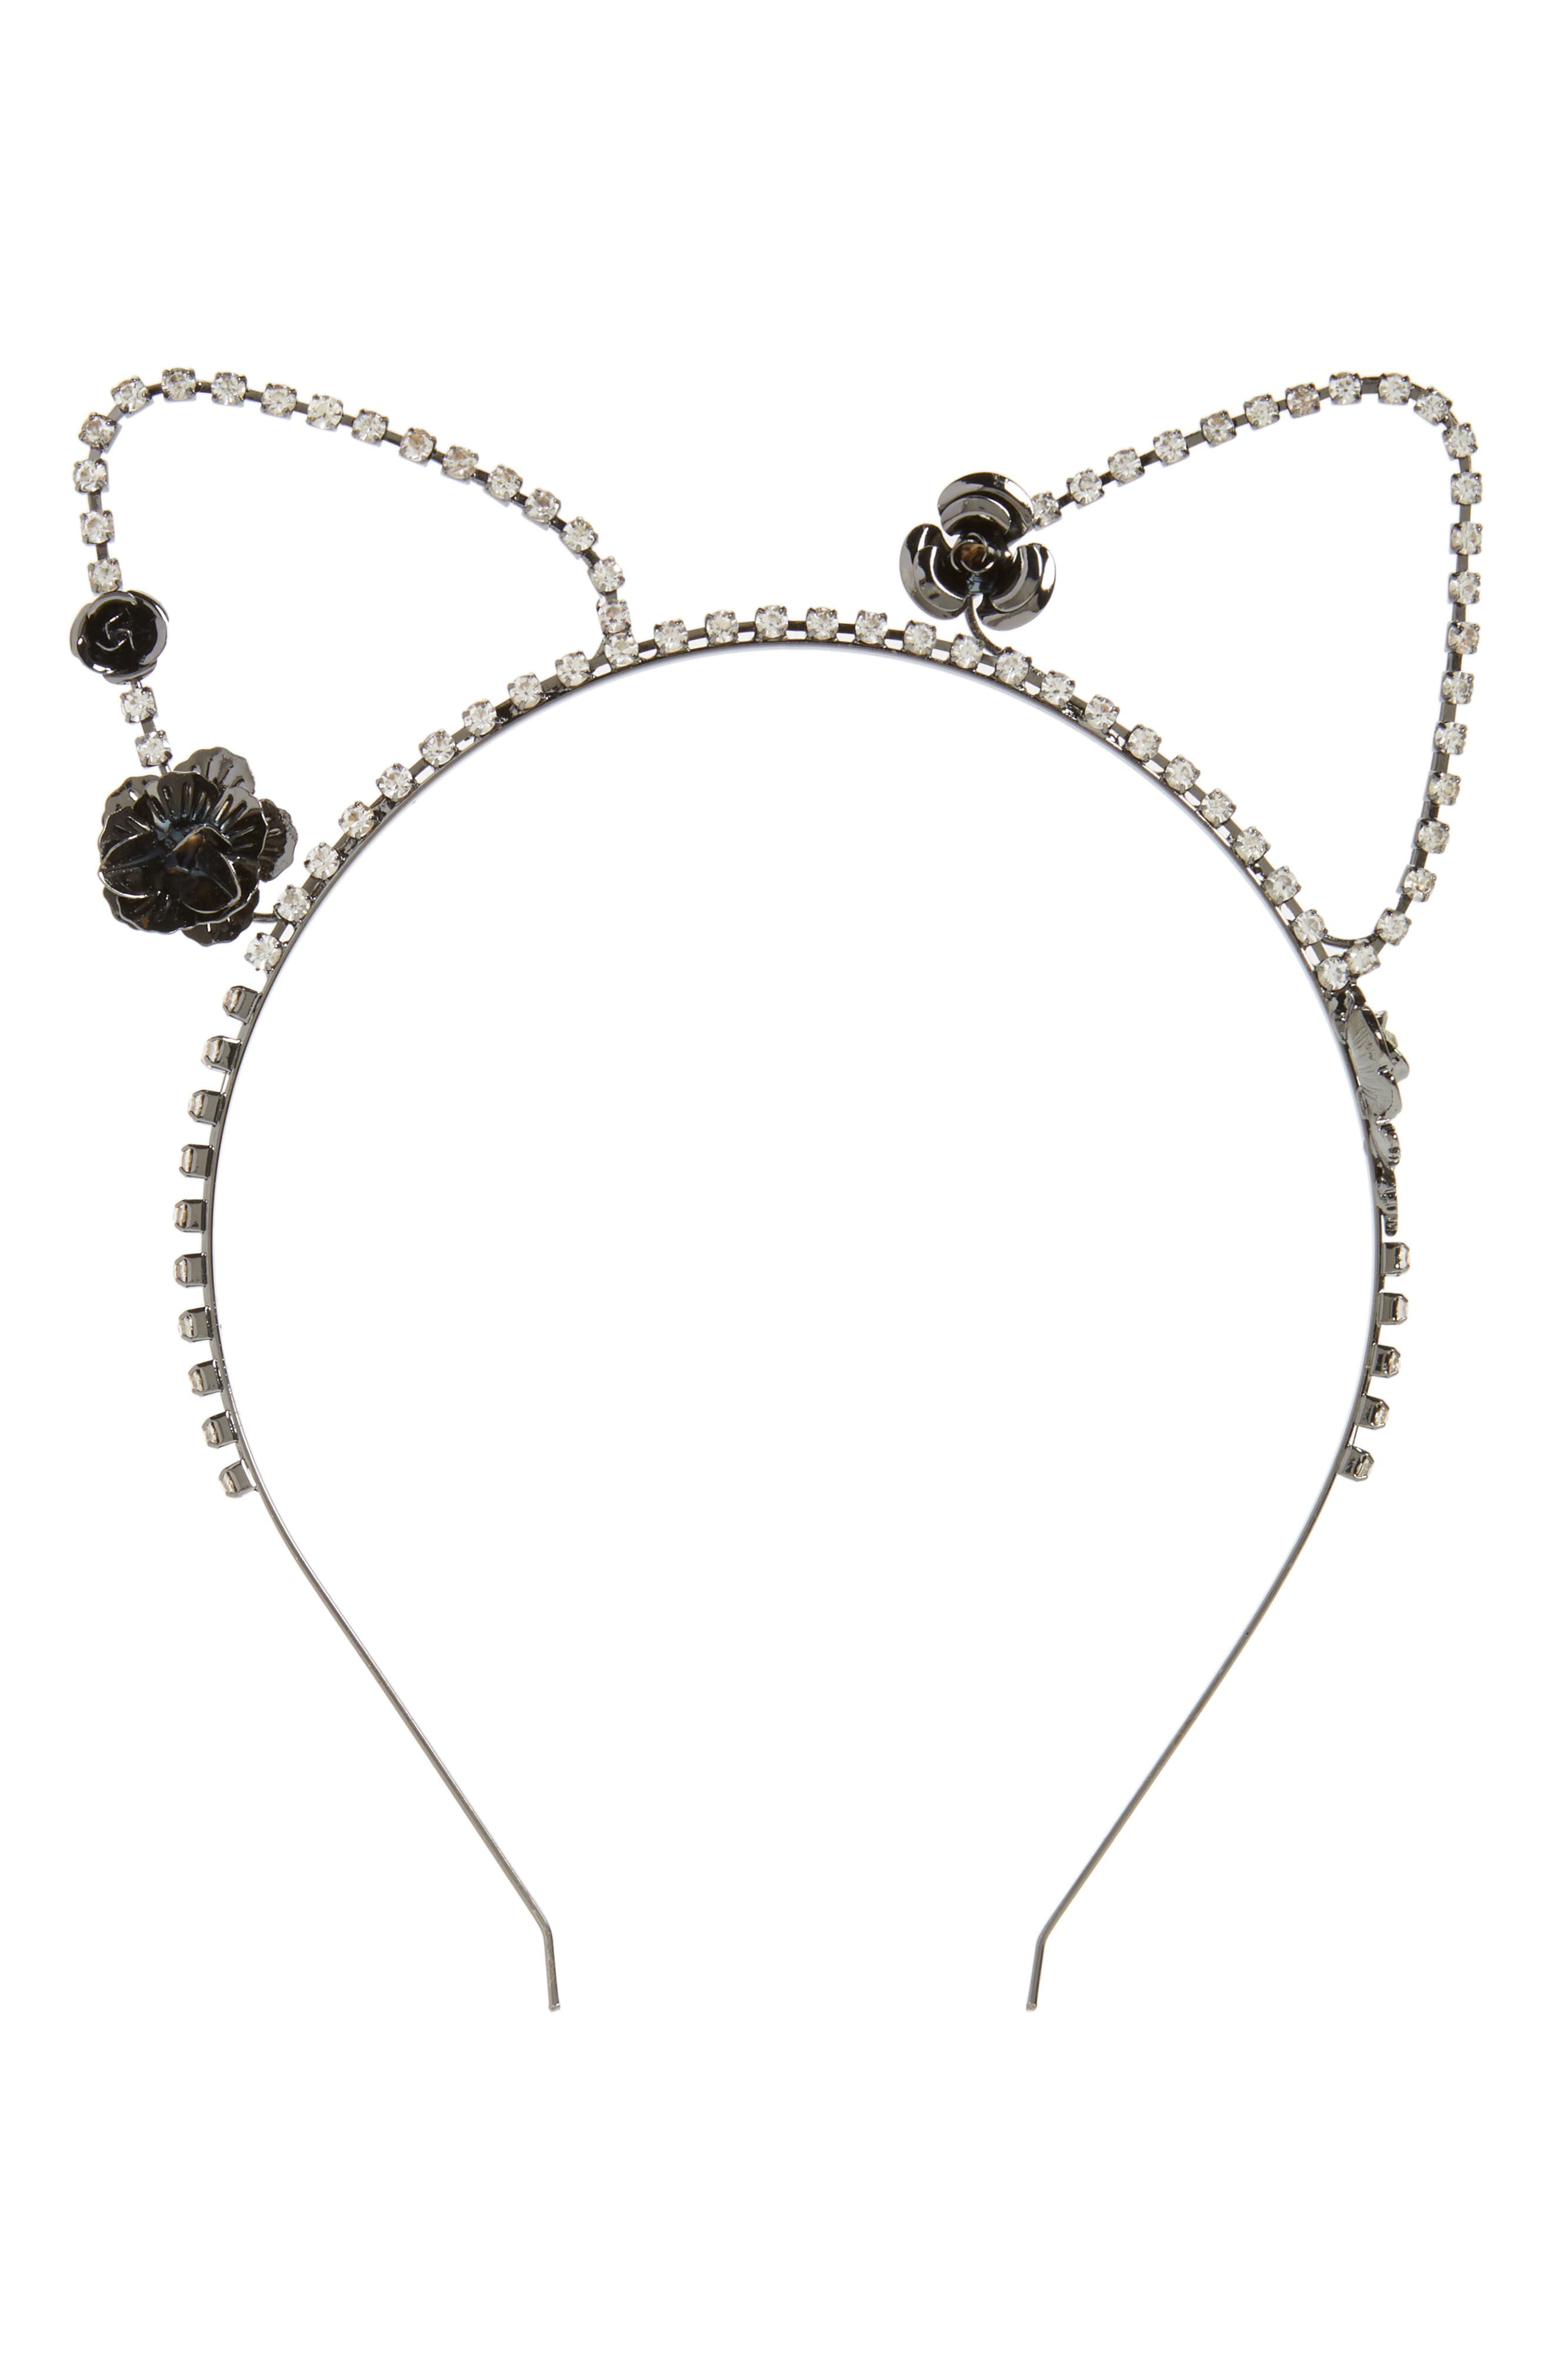 Main Image - Berry Cat Ears & Roses Headband